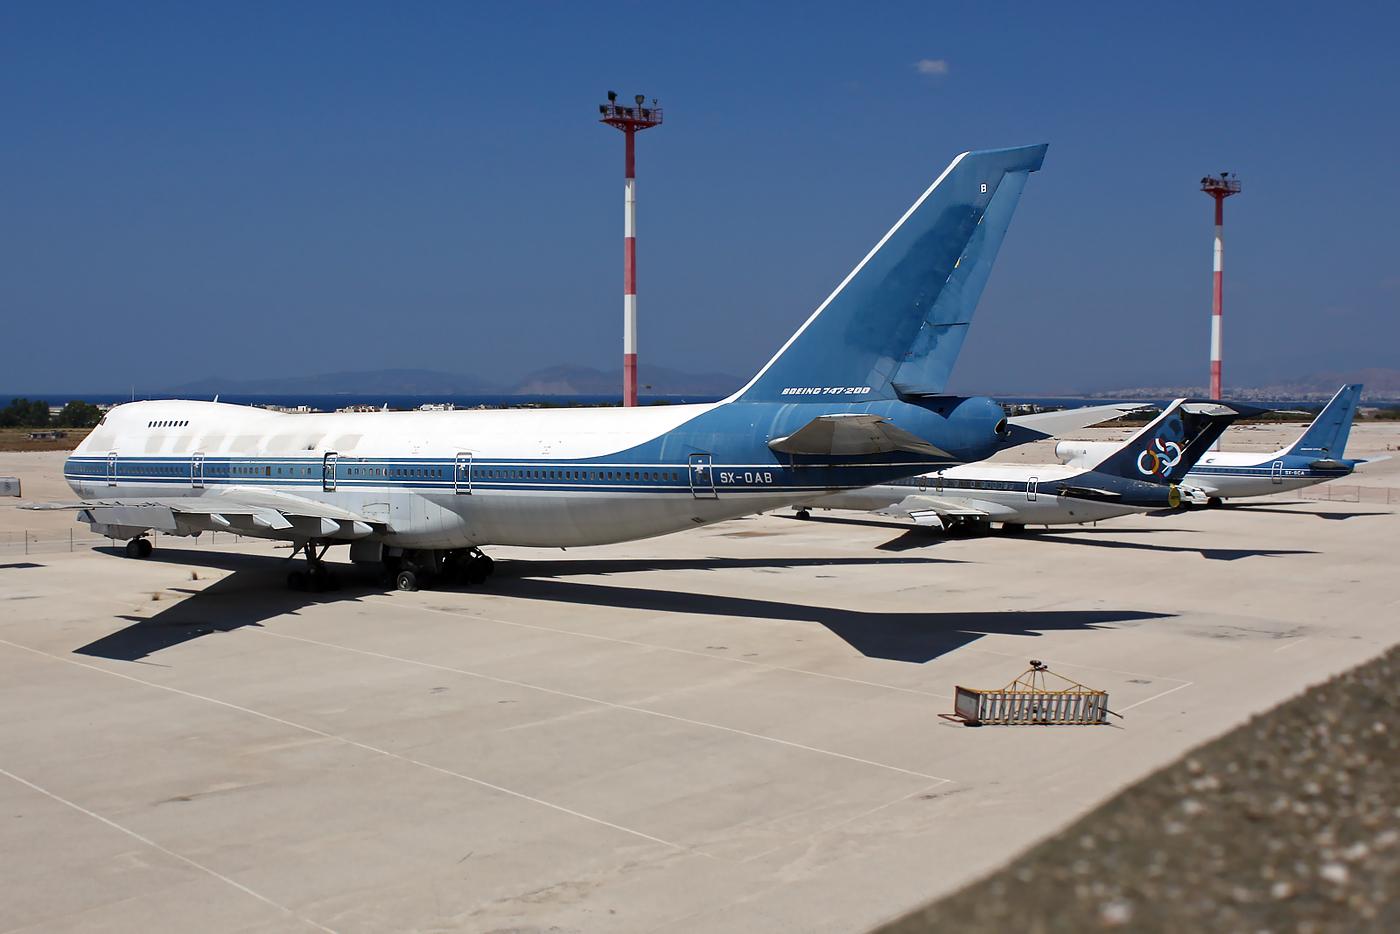 Olympic Boeing 747-200 SX-OAB